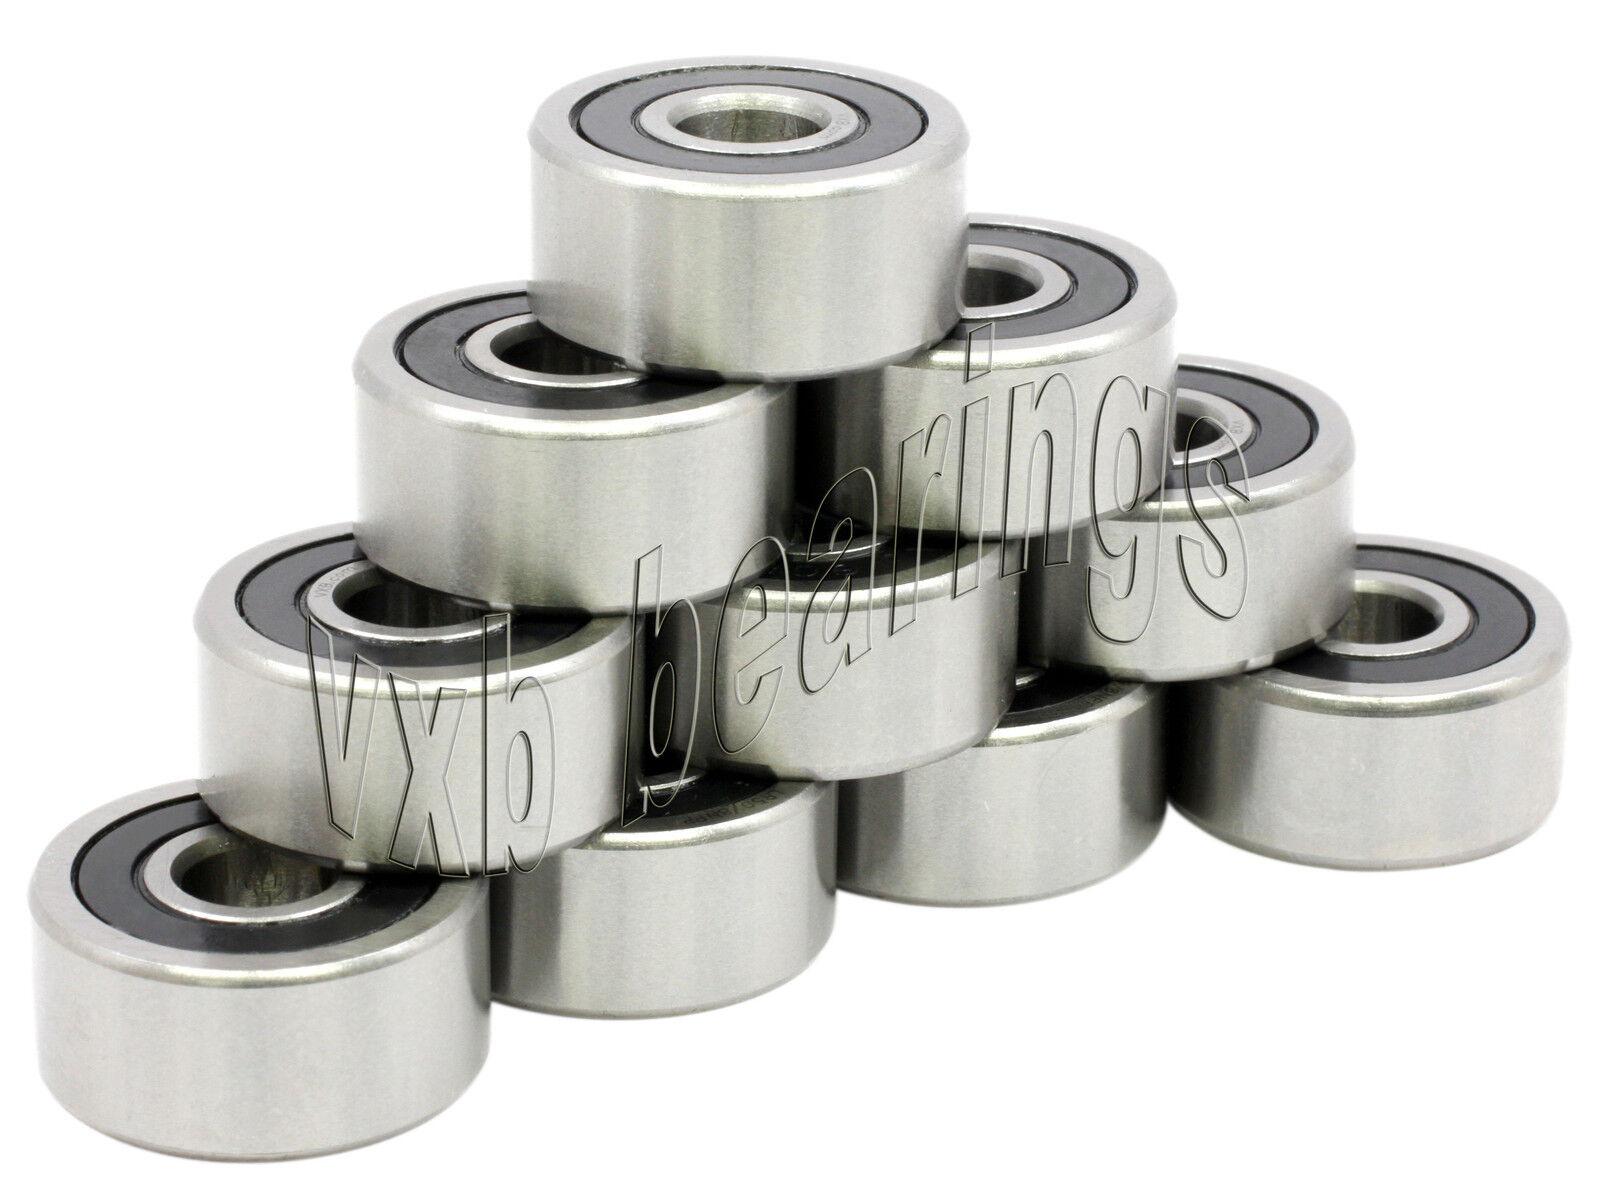 "10 Bearings 1616R5 Ball Bearing 1//2/"" Half inch 1616 R5"